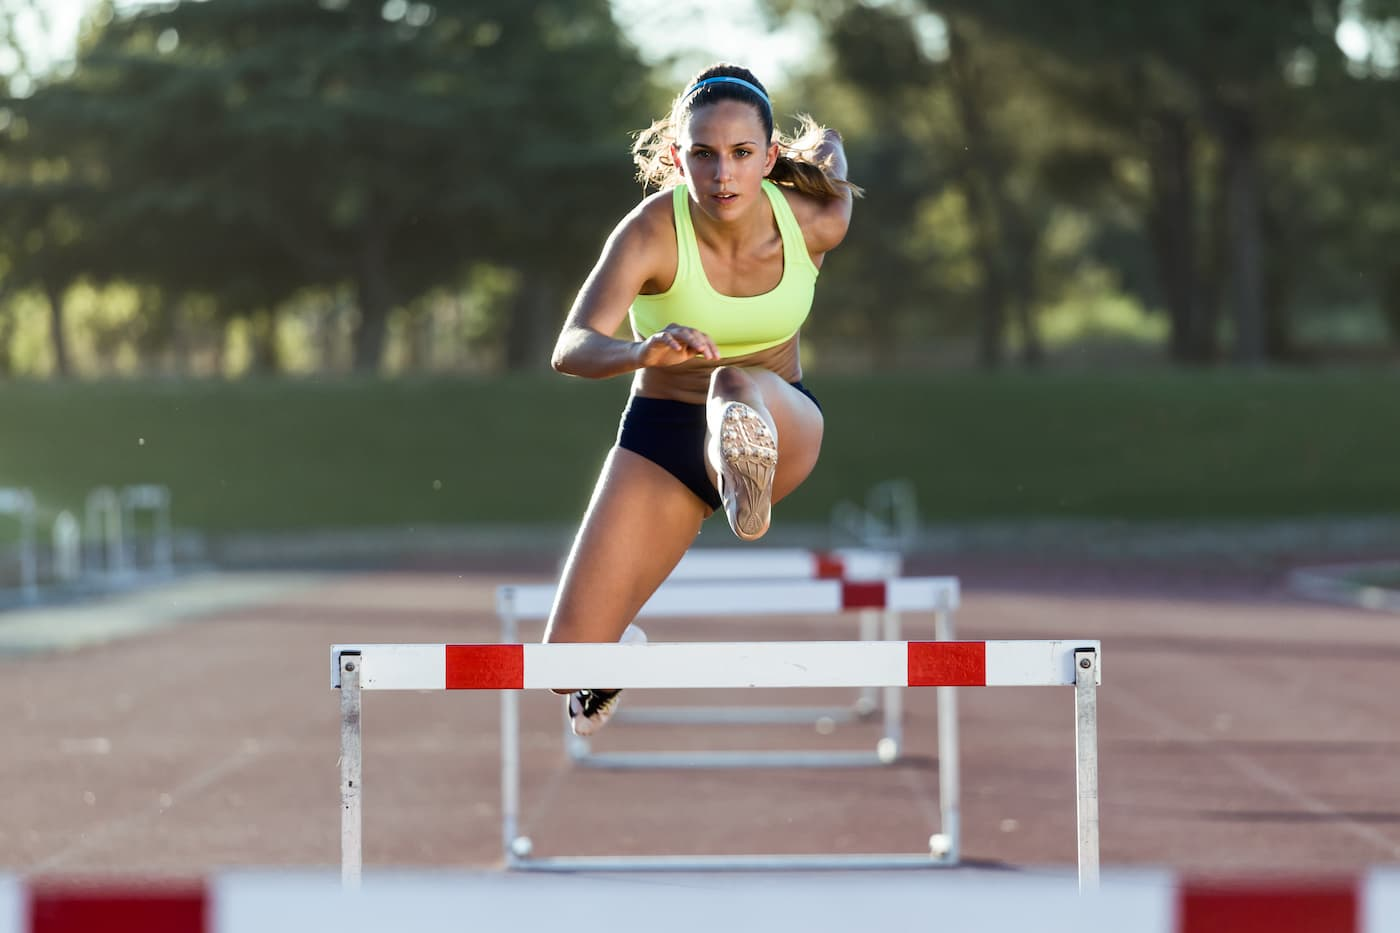 gender bias in sports images